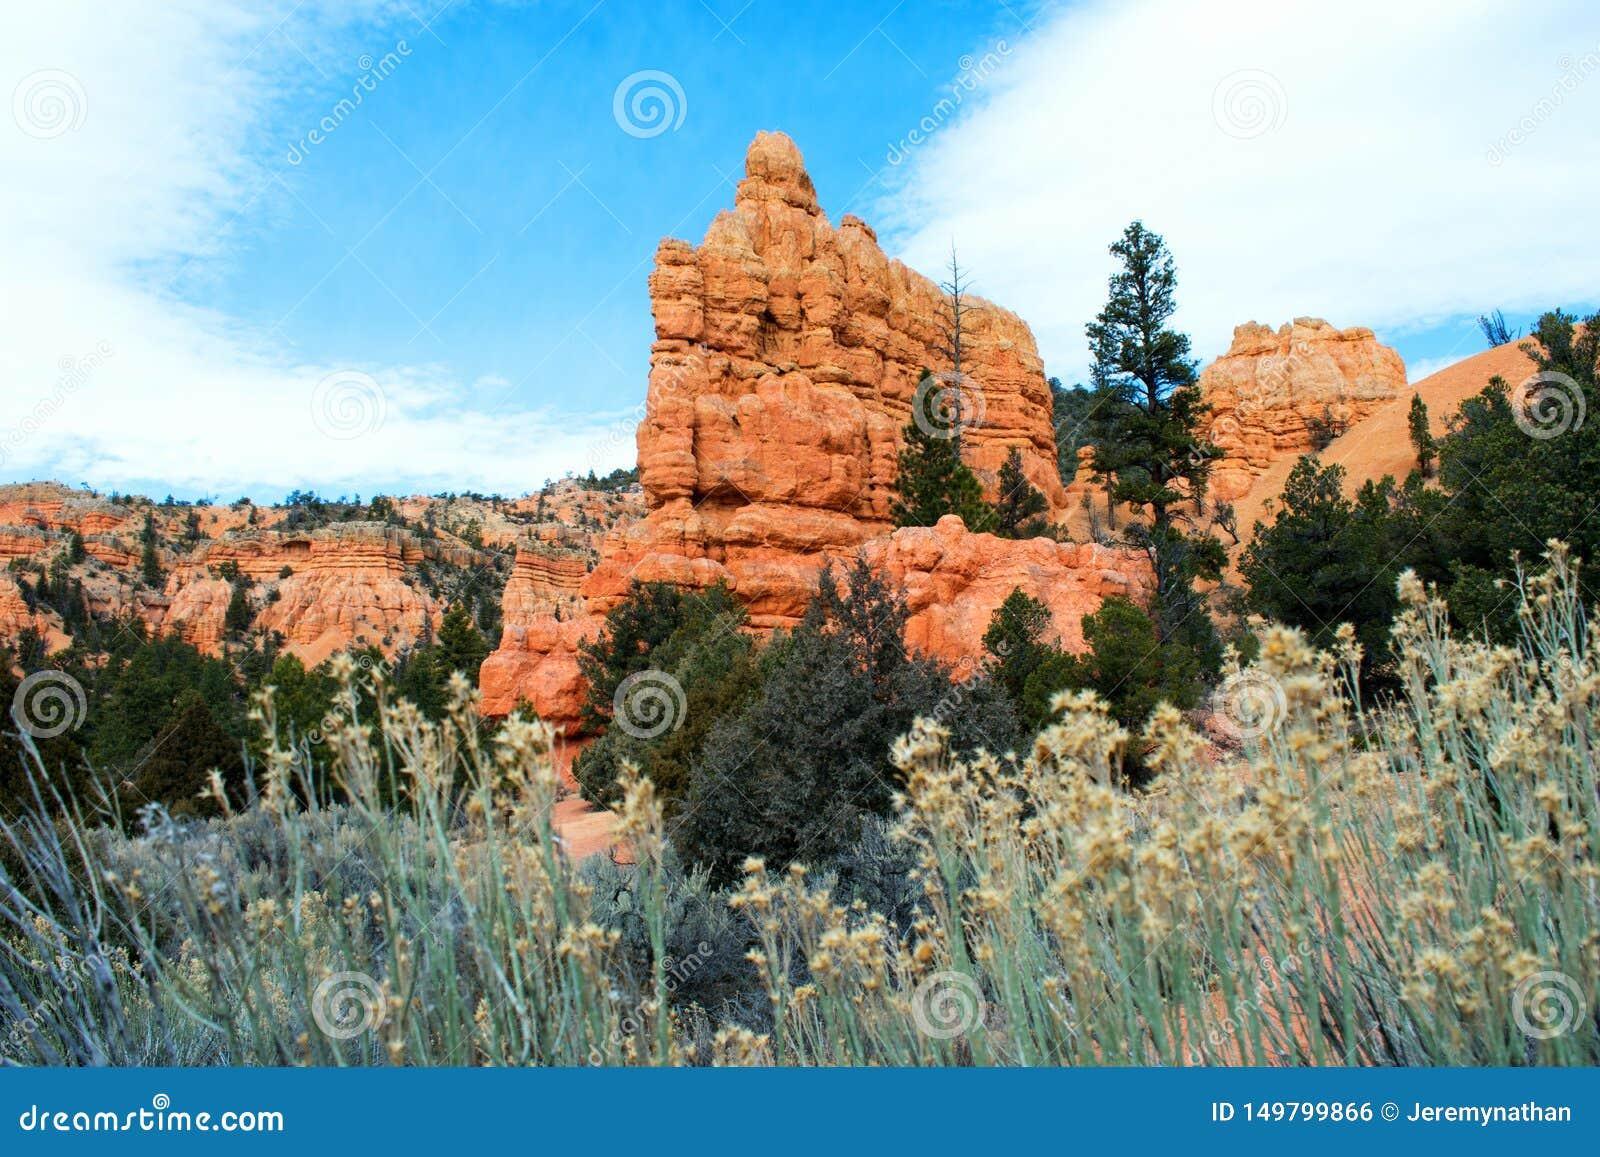 Arches National Park, Rocks Red Desert Mountain Landscape